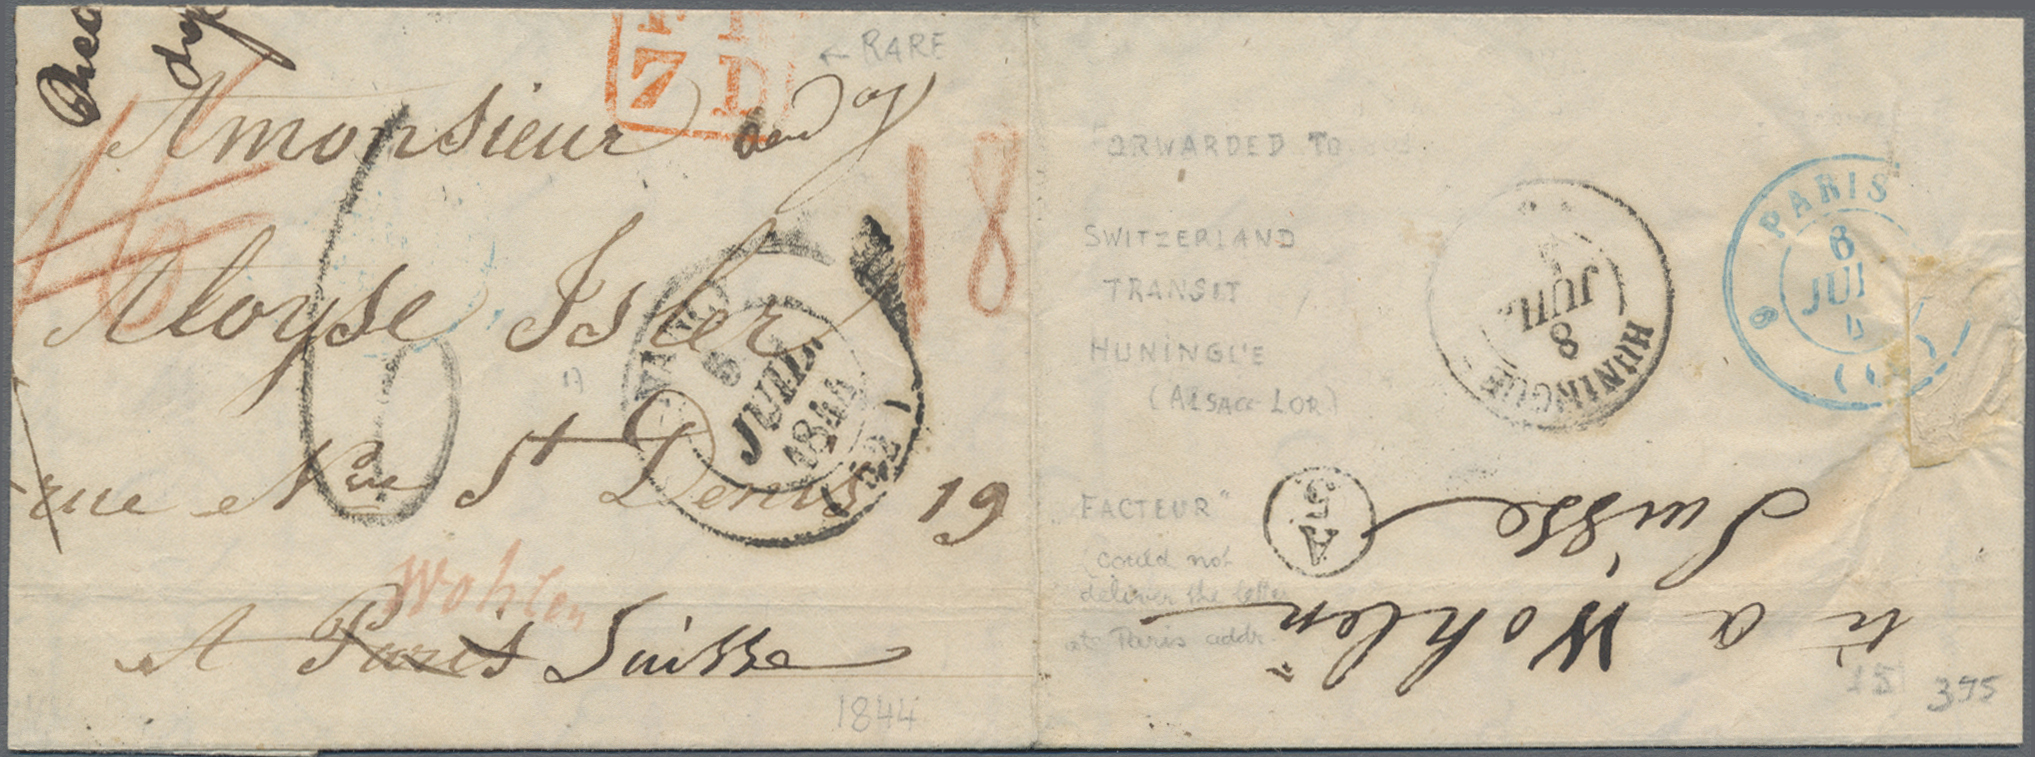 Lot 19677 - nachlässe  -  Auktionshaus Christoph Gärtner GmbH & Co. KG Sale #48 Estates, supplement Germany before & after 1945